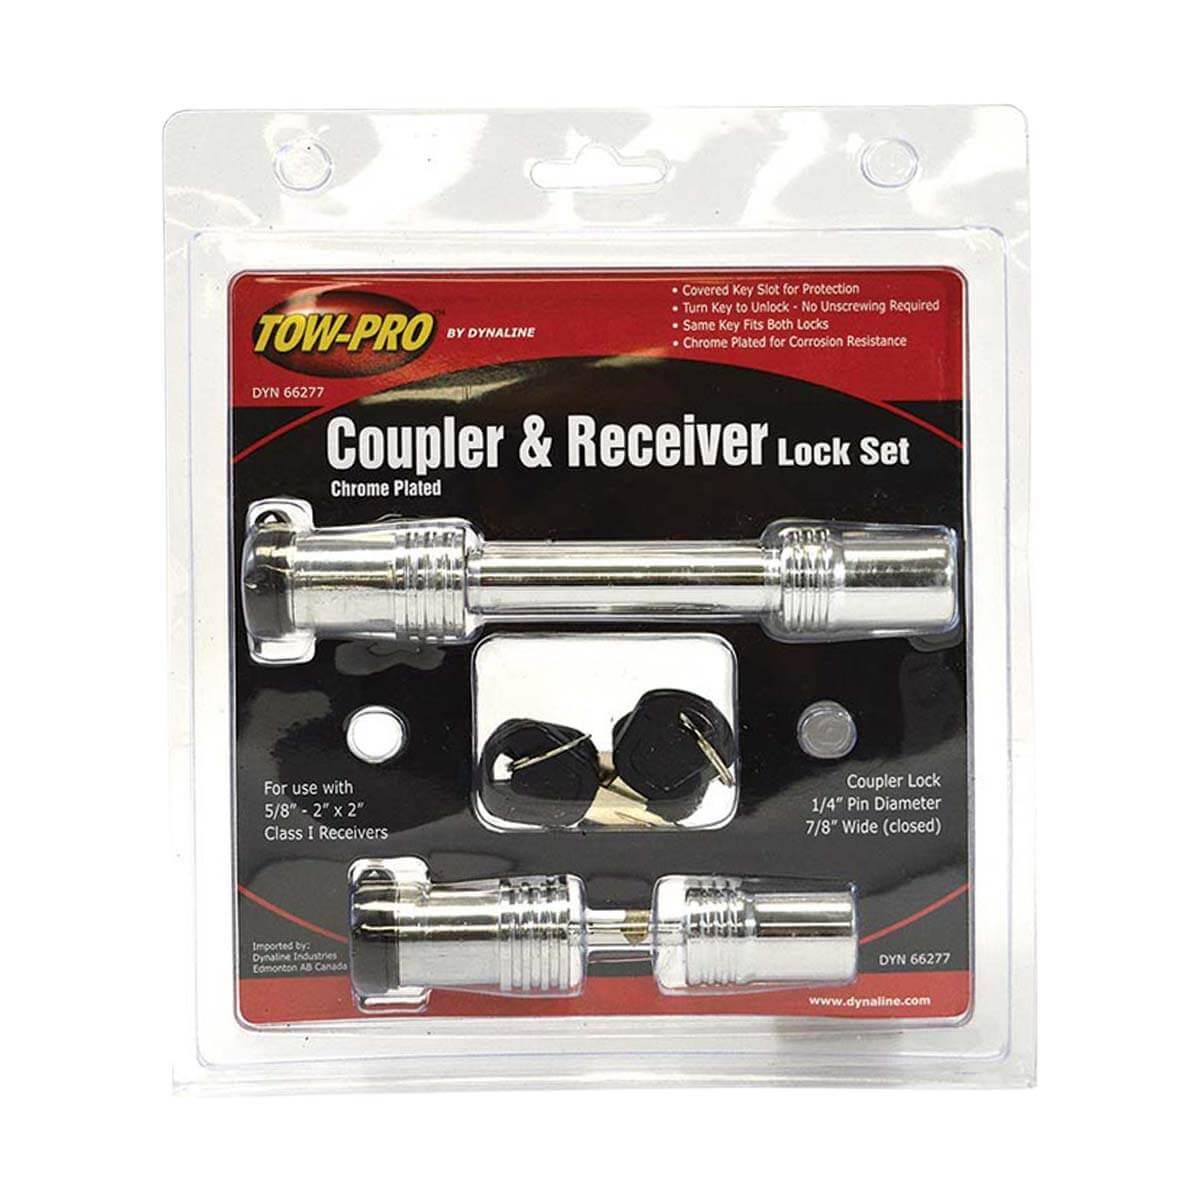 Coupler & Receiver Lock Set